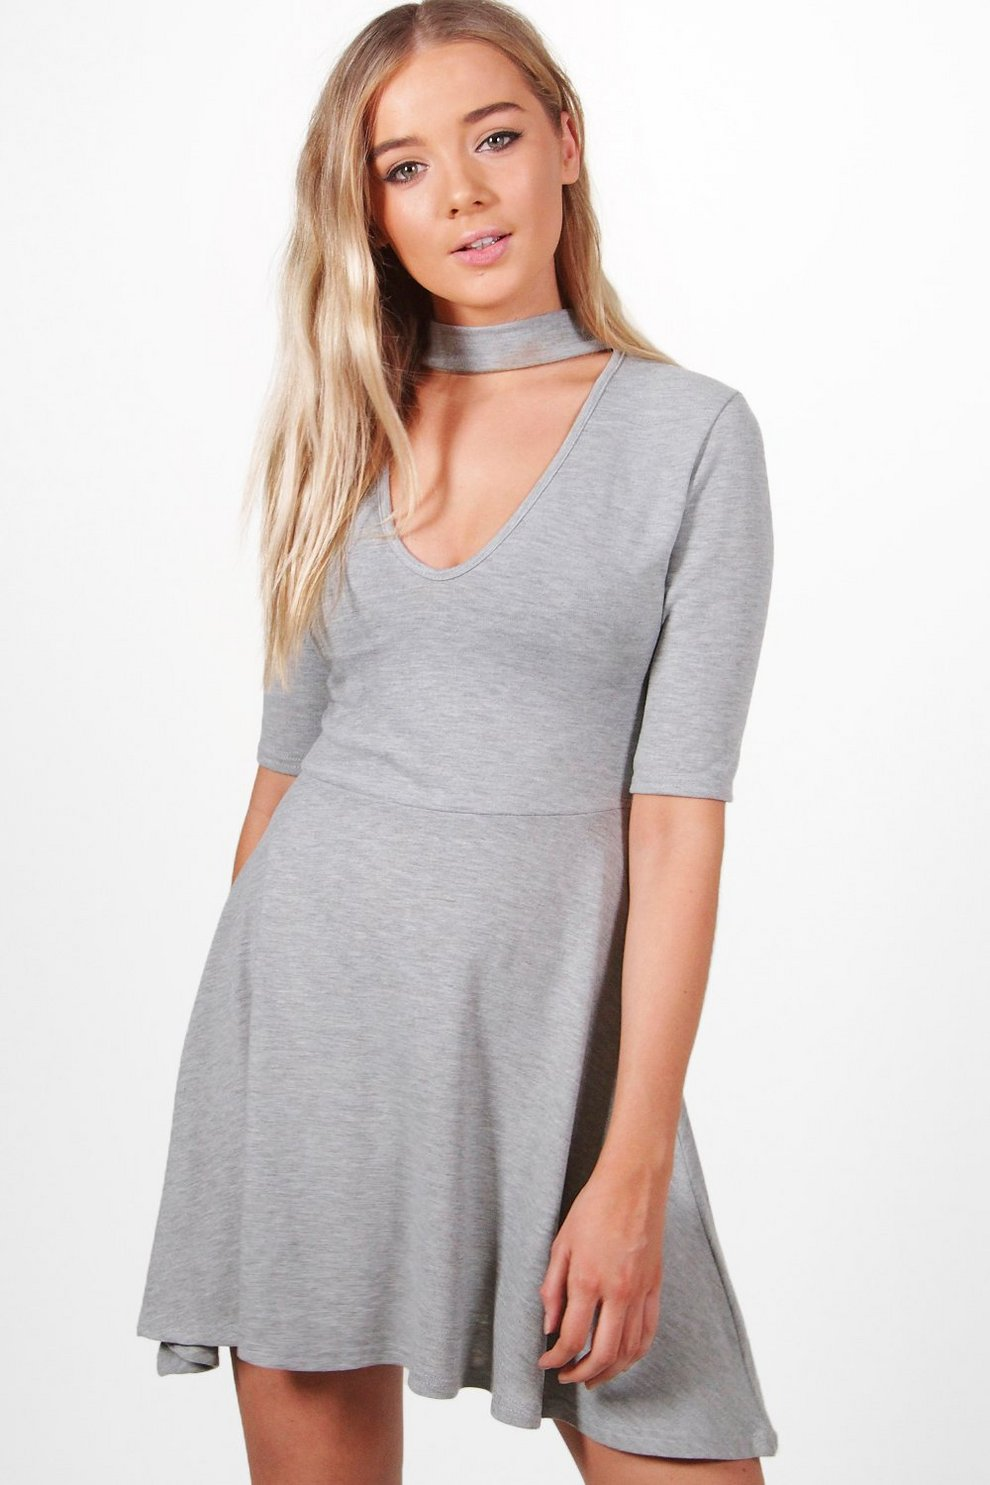 a553ef8b24 Bella Choker Knitted Skater Dress